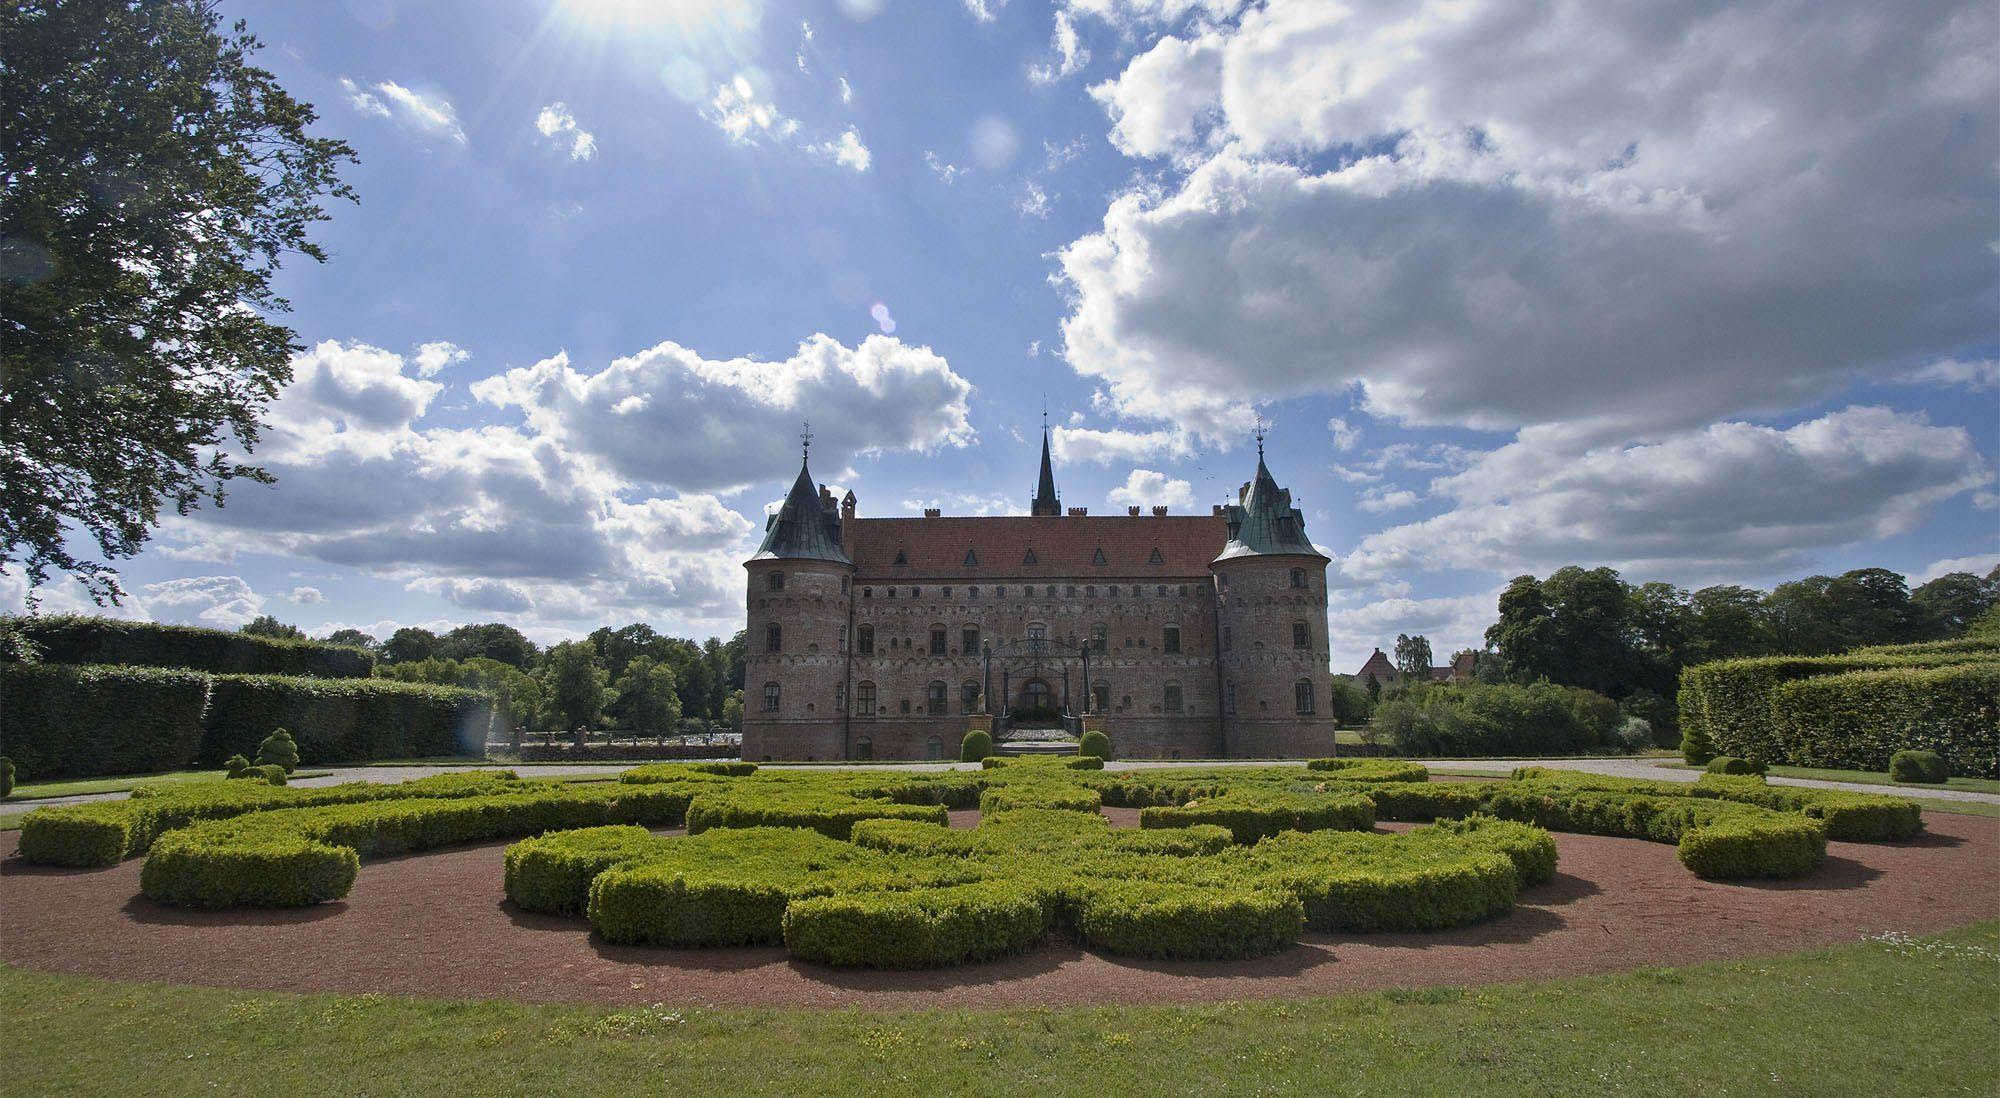 egeskov1 Egeskov Renaissance Water Castle in Denmark